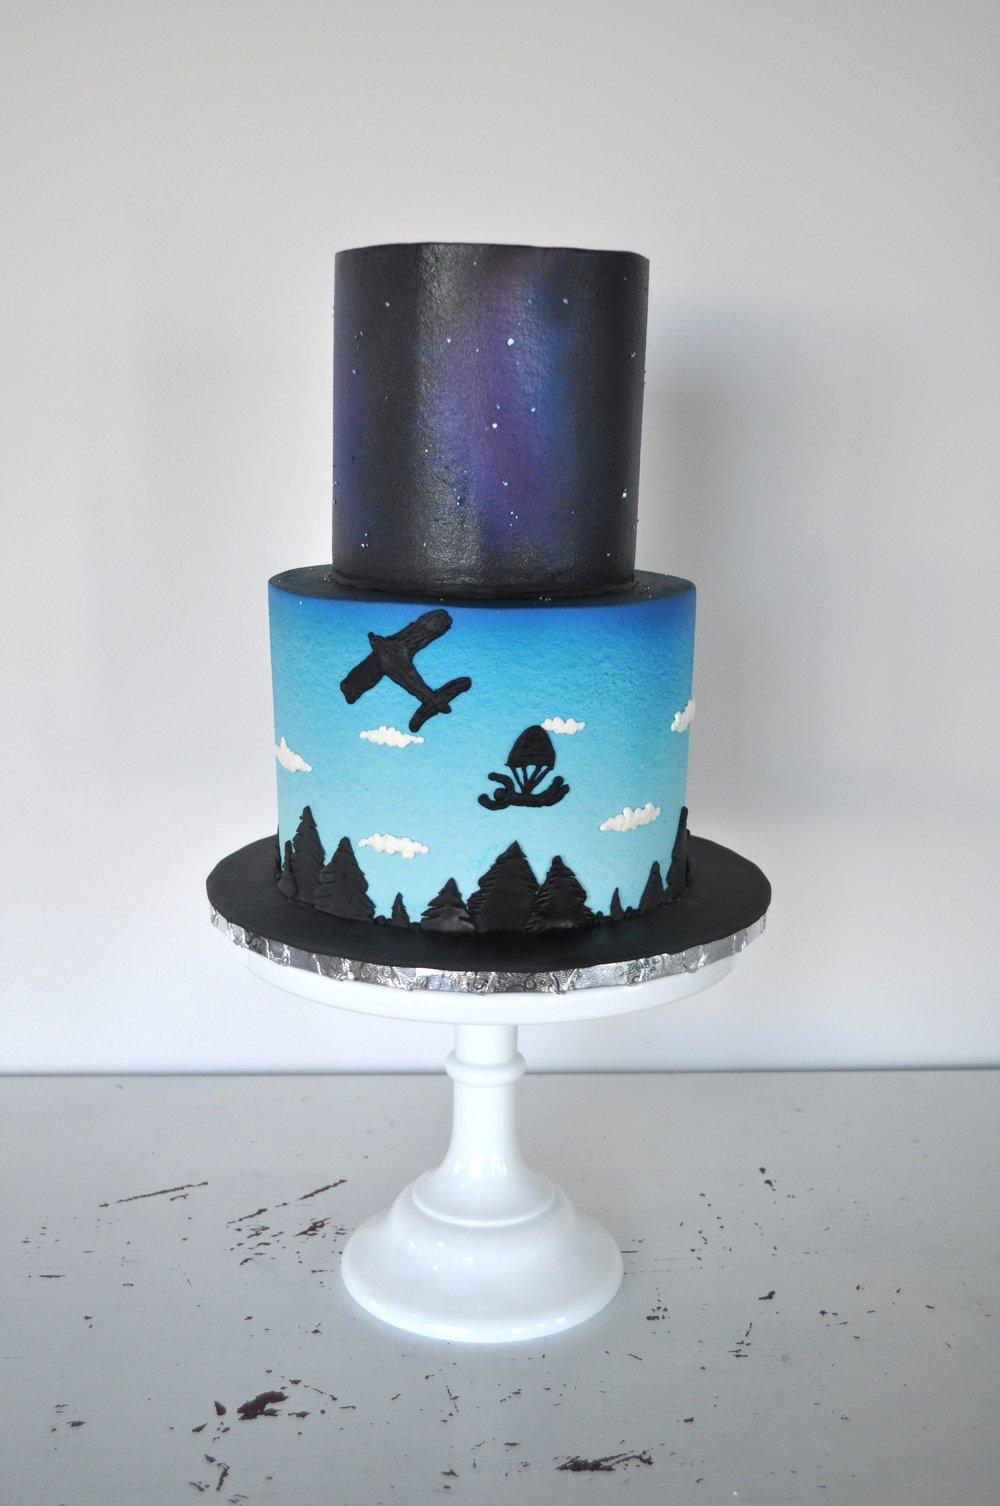 custom-cake-airbrush-skydive-sugarbeesweets.jpg